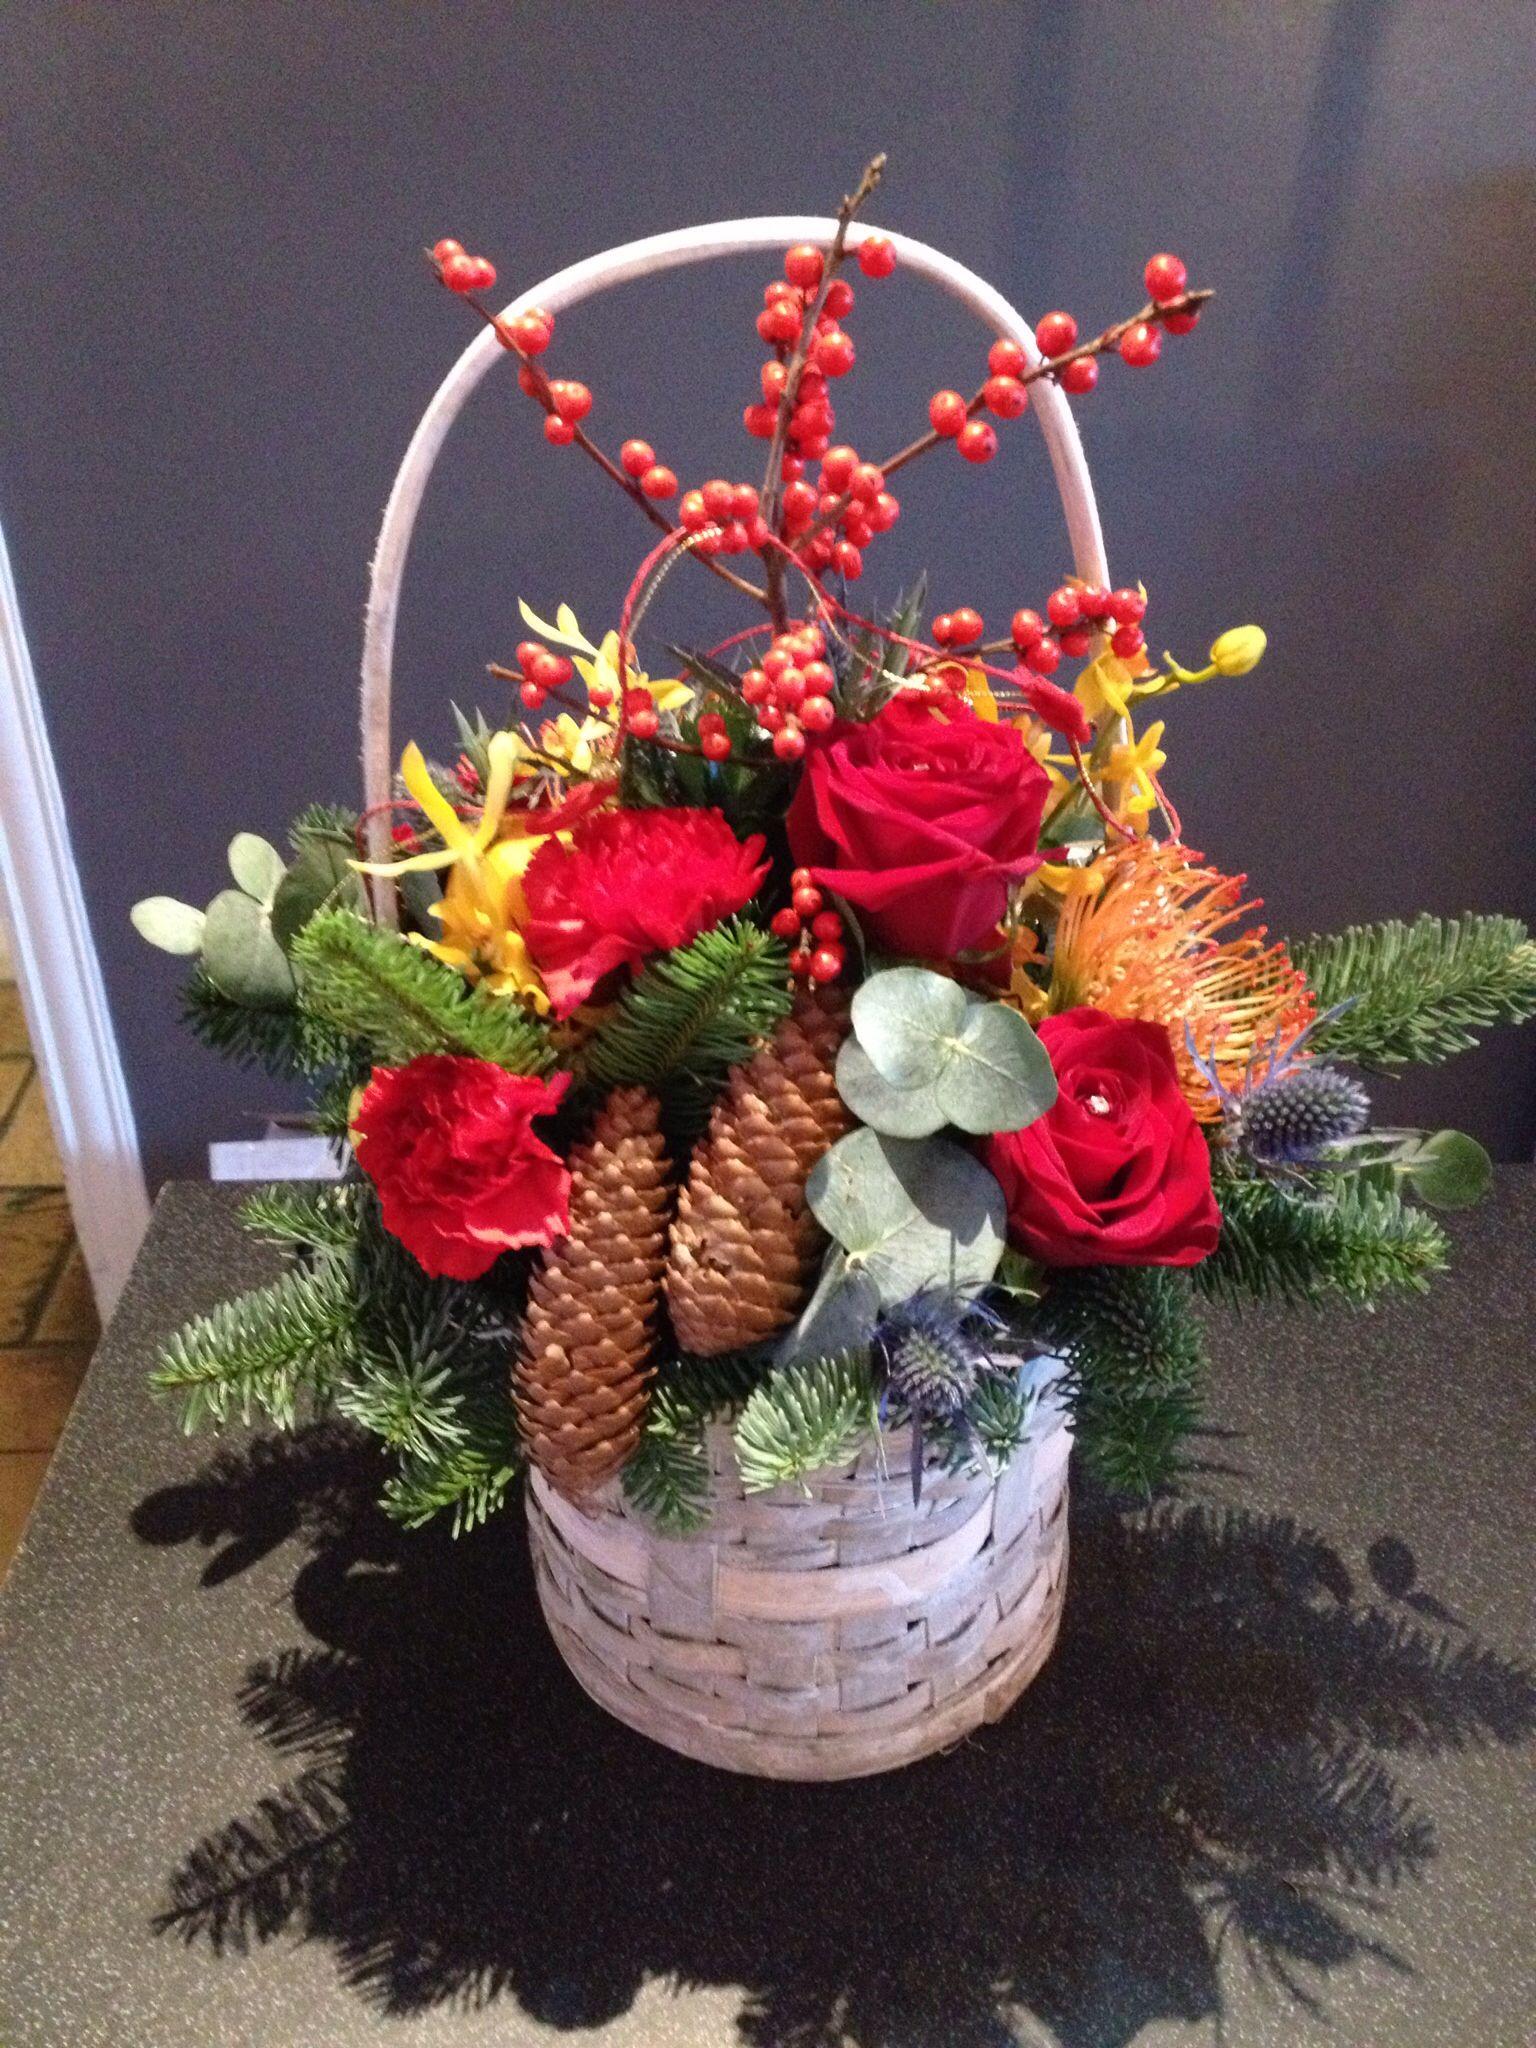 Luxury Christmas Basket Flower shop, Christmas baskets